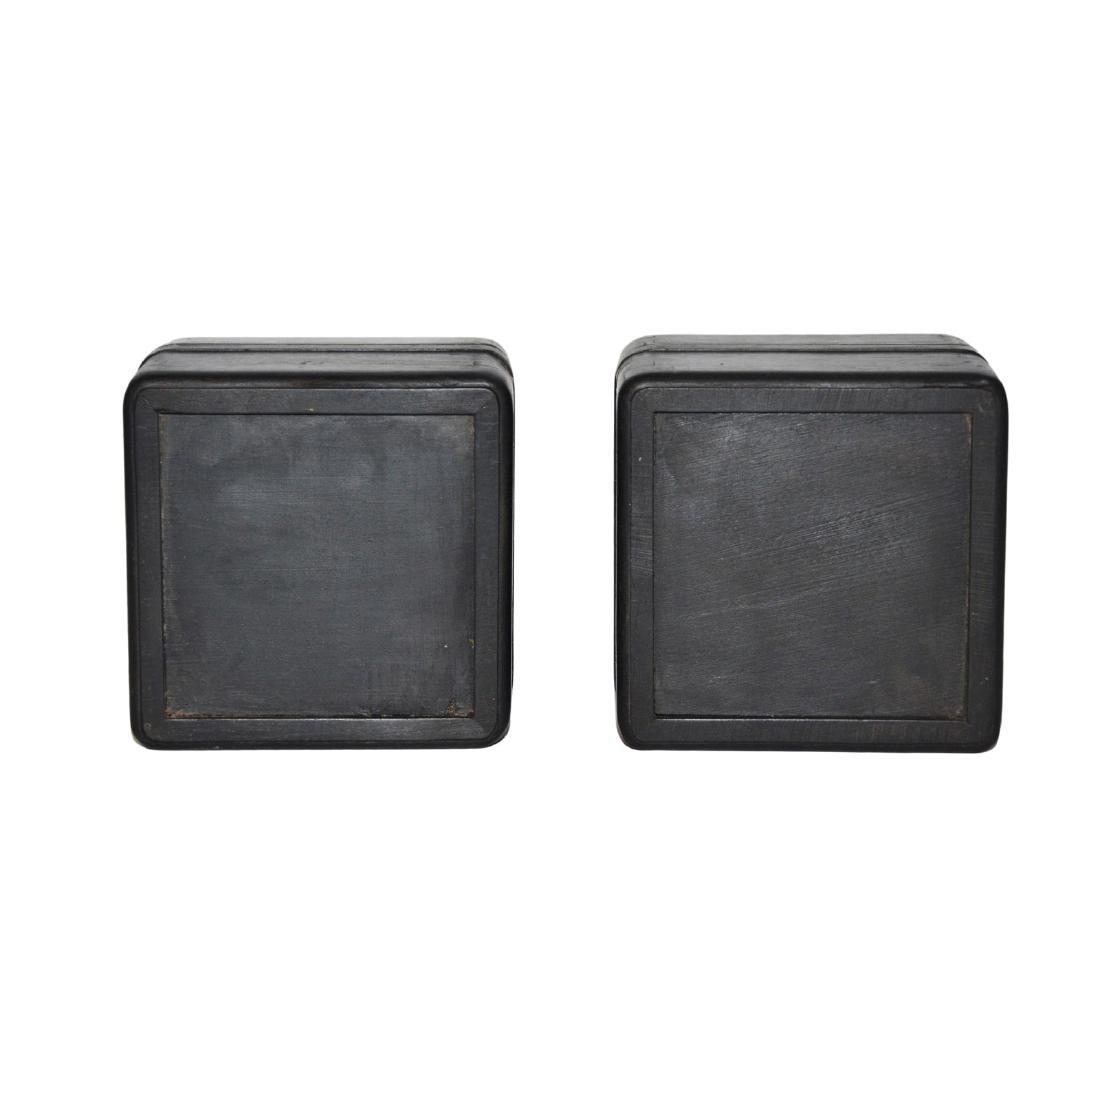 Qing, A Pair of Small Zitan Square Box - 6